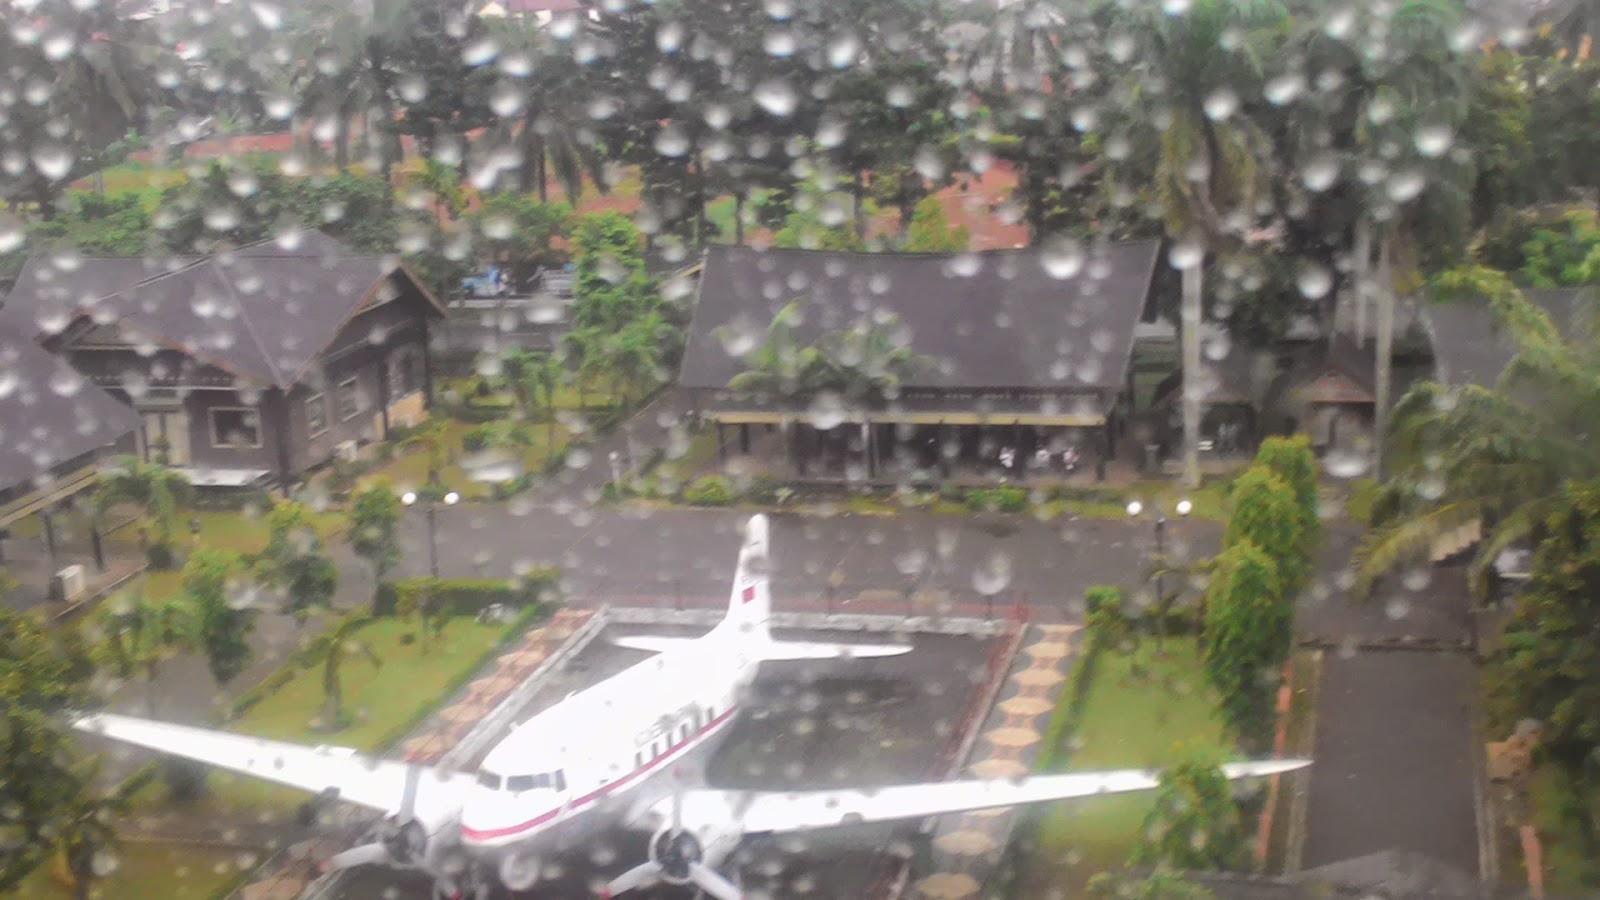 Naik Kereta Gantung Taman Mini Jakarta Iii Tamat Memuas Muaskan